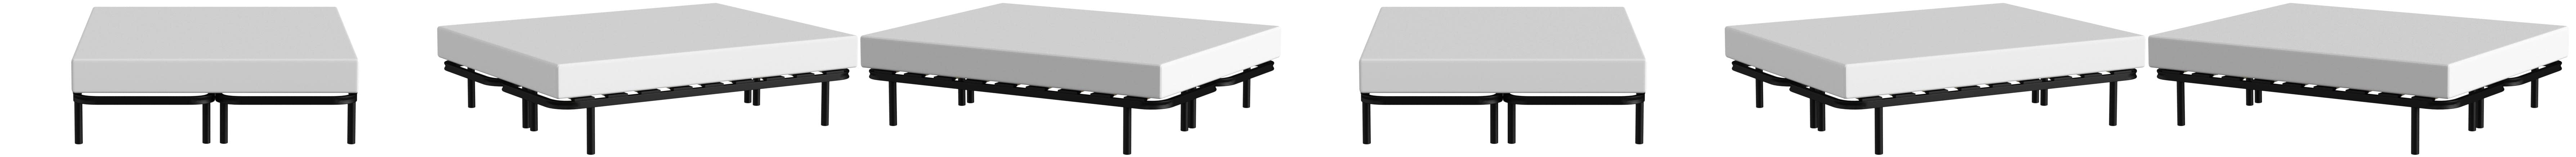 LA WEB DEL COLCHON Somier Multiláminas Regulador (*) 150 x 190 (2 ud. 75x190) x 5 cms. (8 Patas Incluidas)